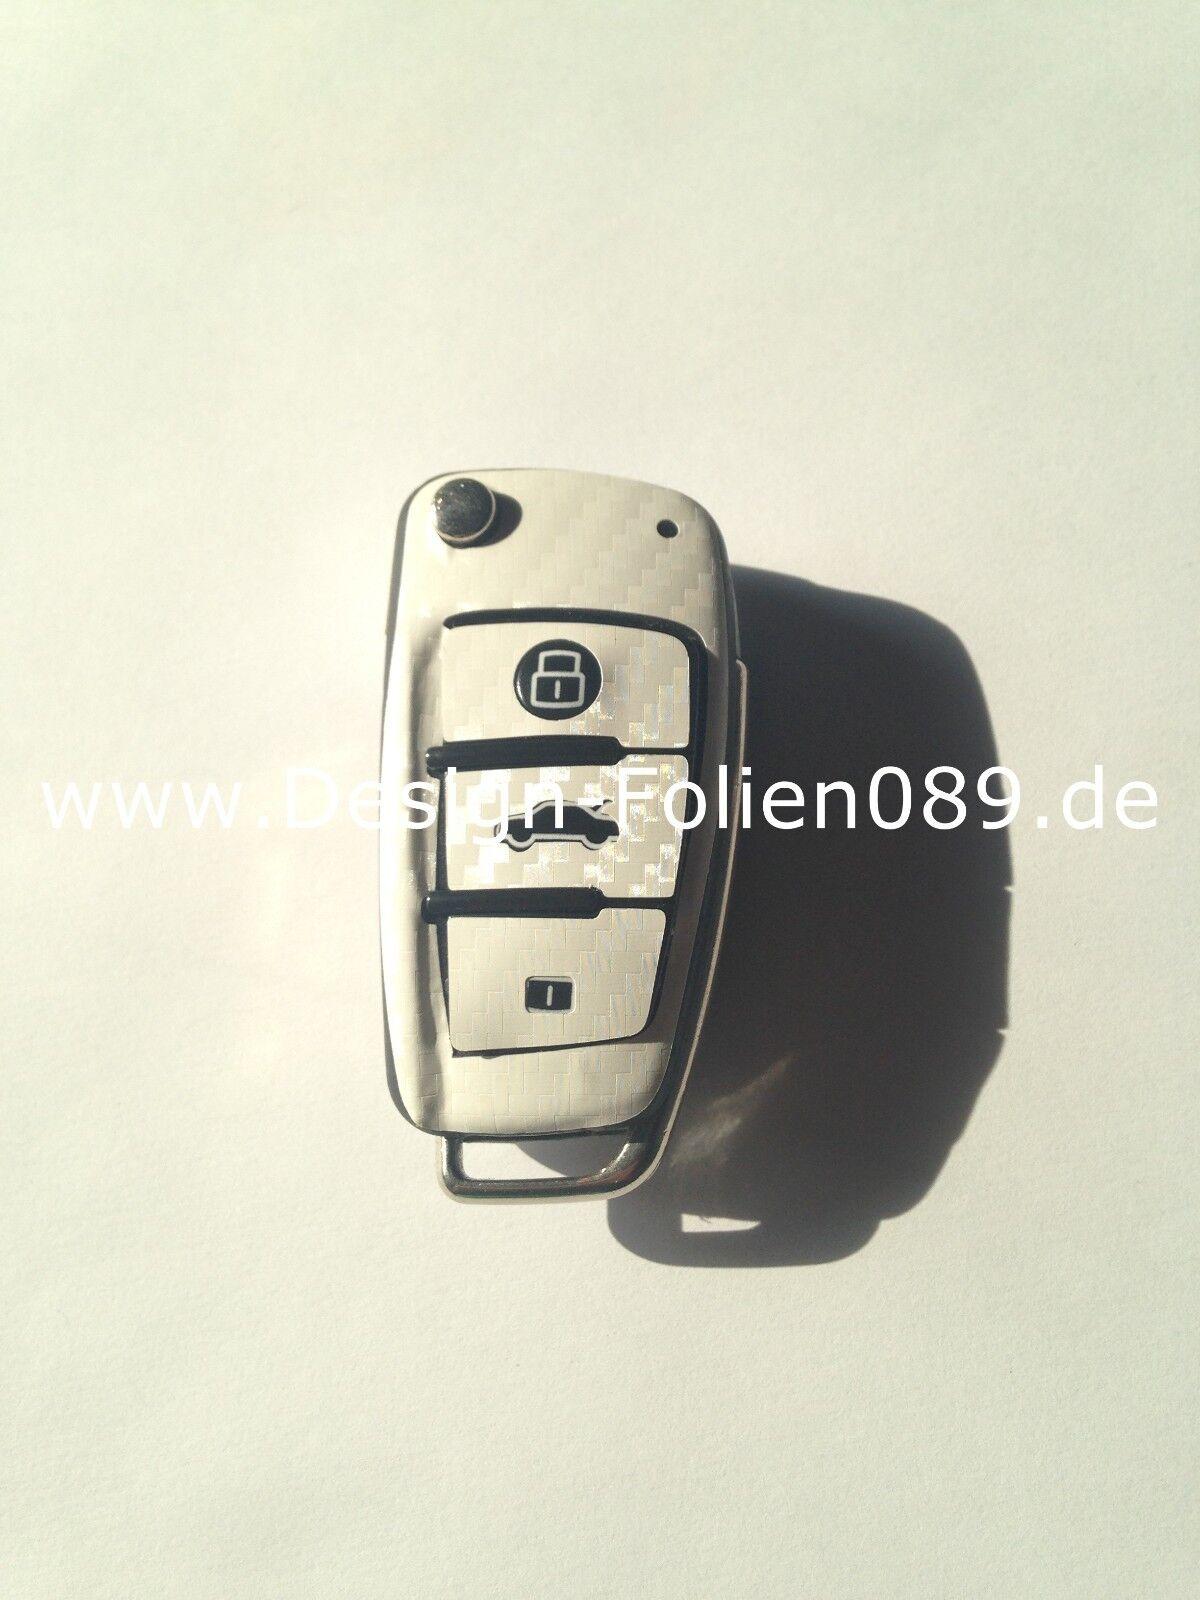 Carbon Lila Folie Dekor Schlüssel Audi TT A1 8J A6 A3 8p A4 4F S3 S4 B7 Q7 RS